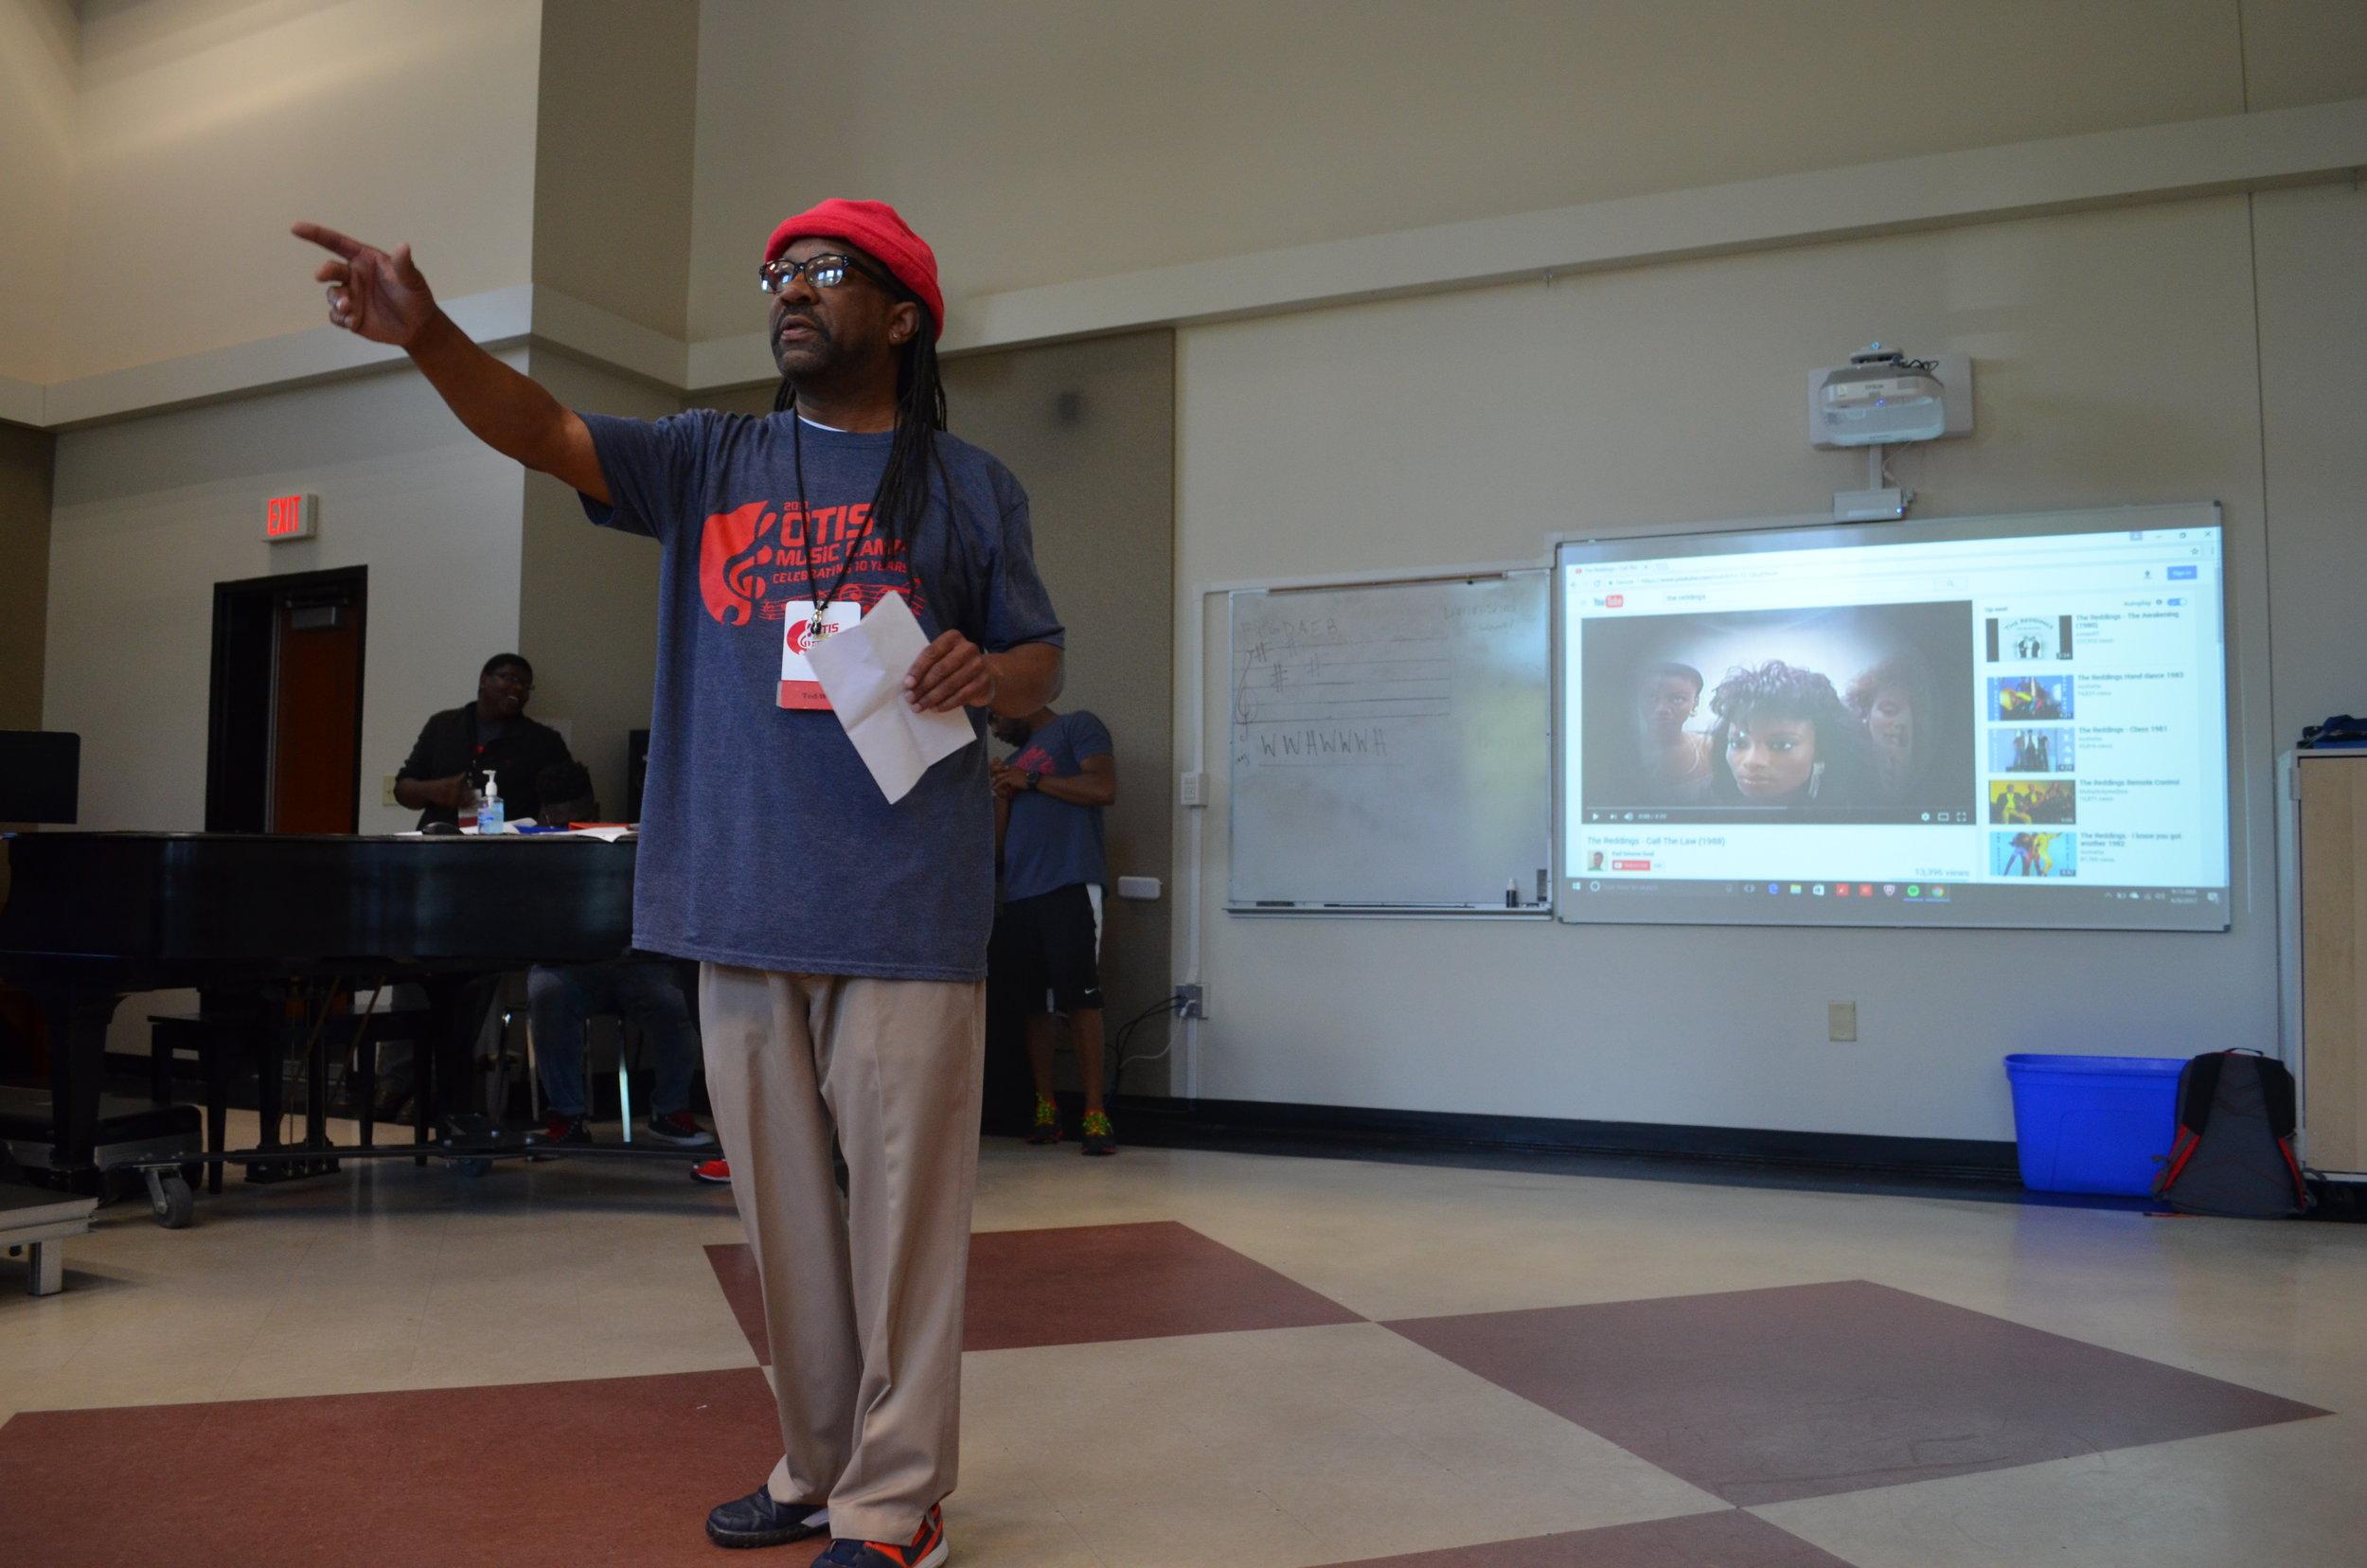 Coach Ted teaching music theory.